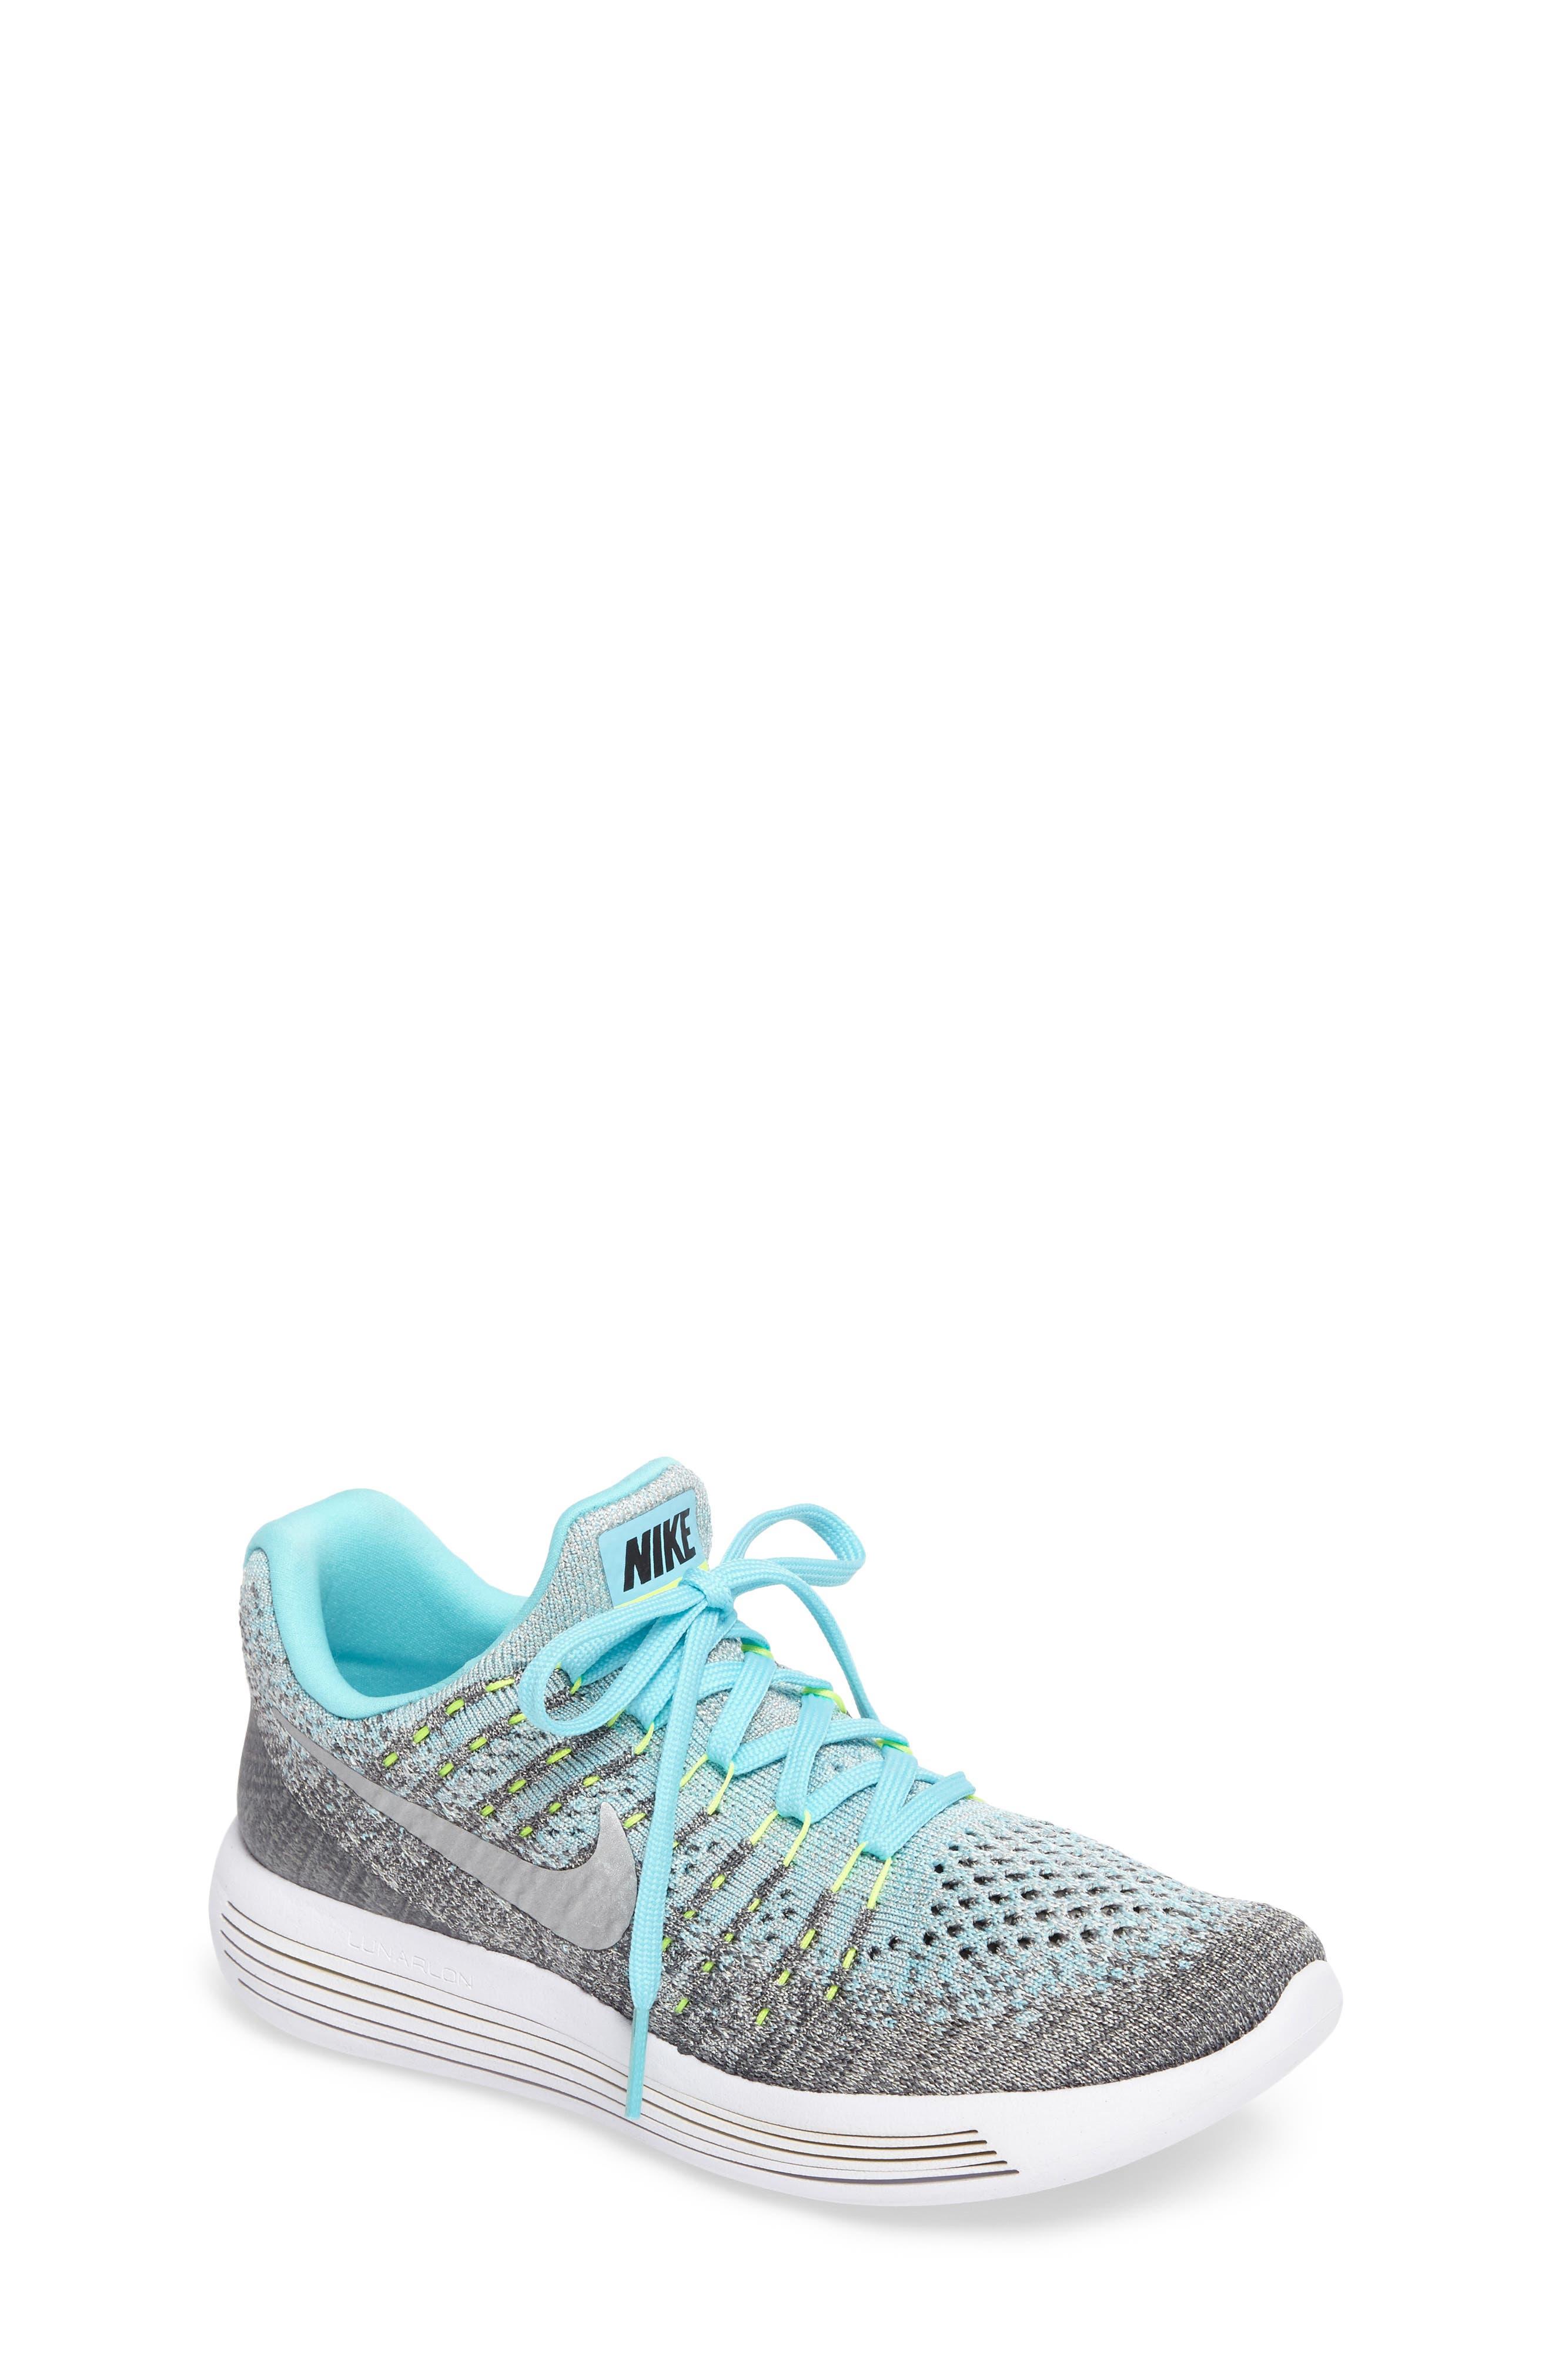 Flyknit LunarEpic Sneaker,                             Main thumbnail 1, color,                             Grey/ Metallic Silver/ Blue